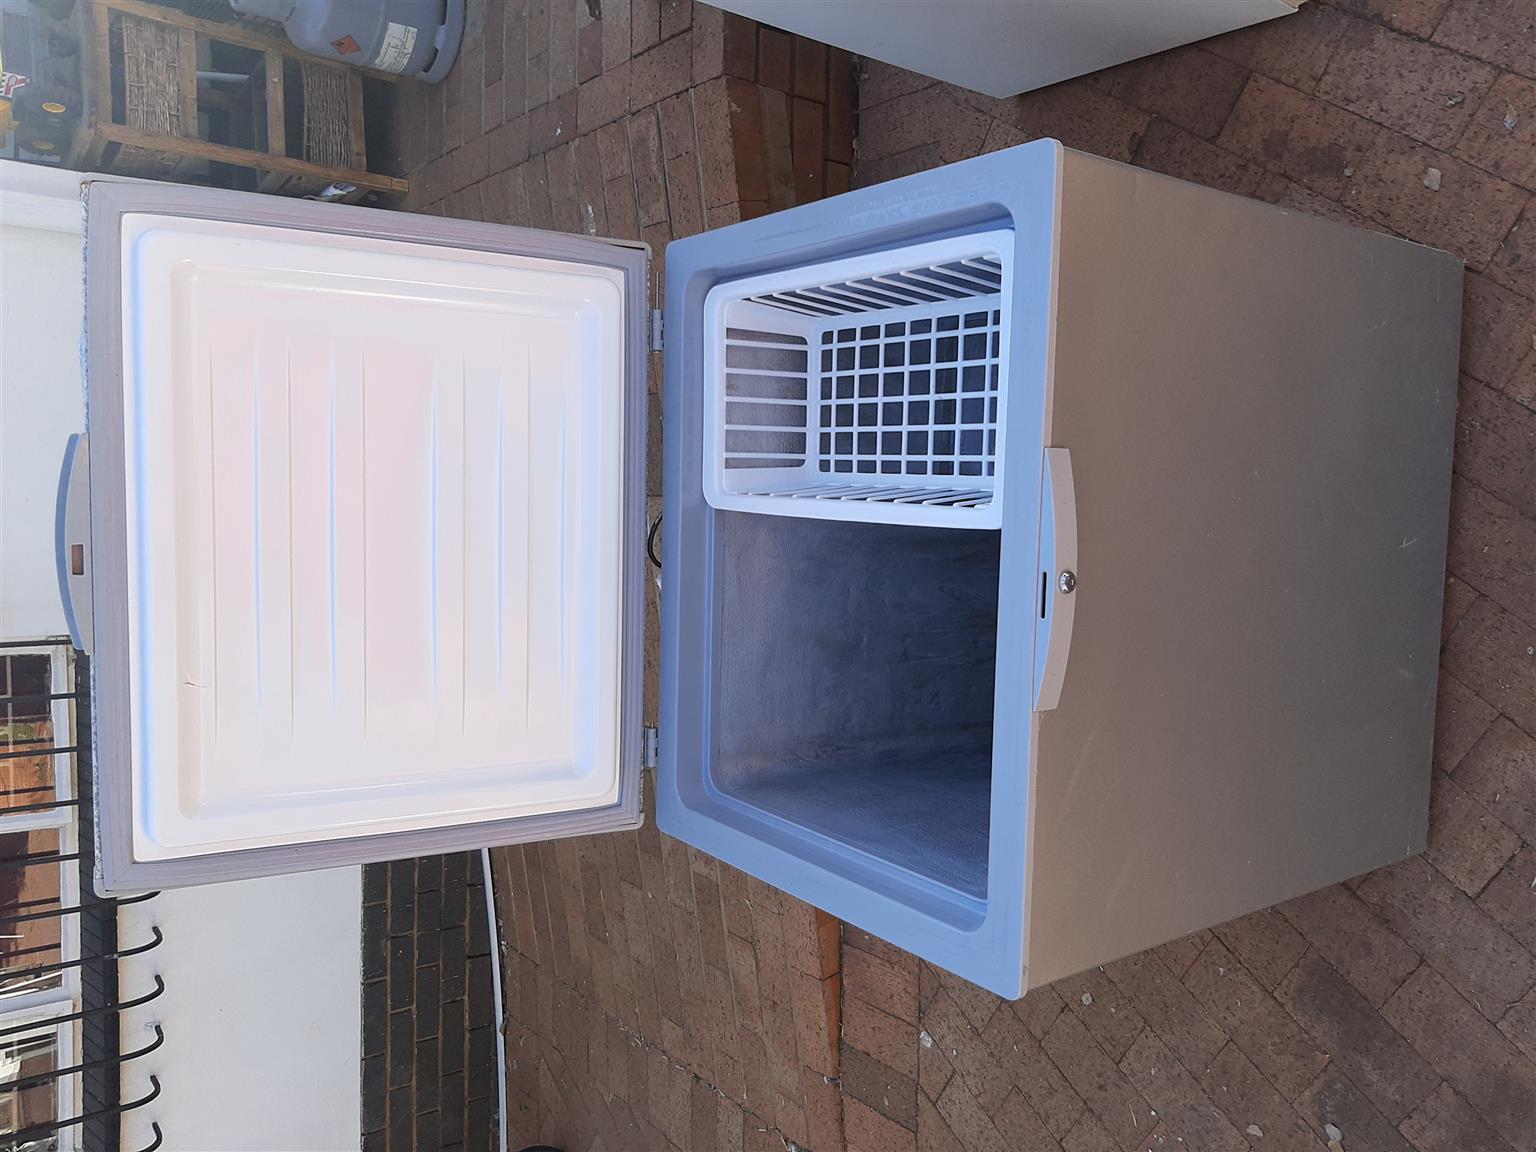 Defy metallic silver chest freezer